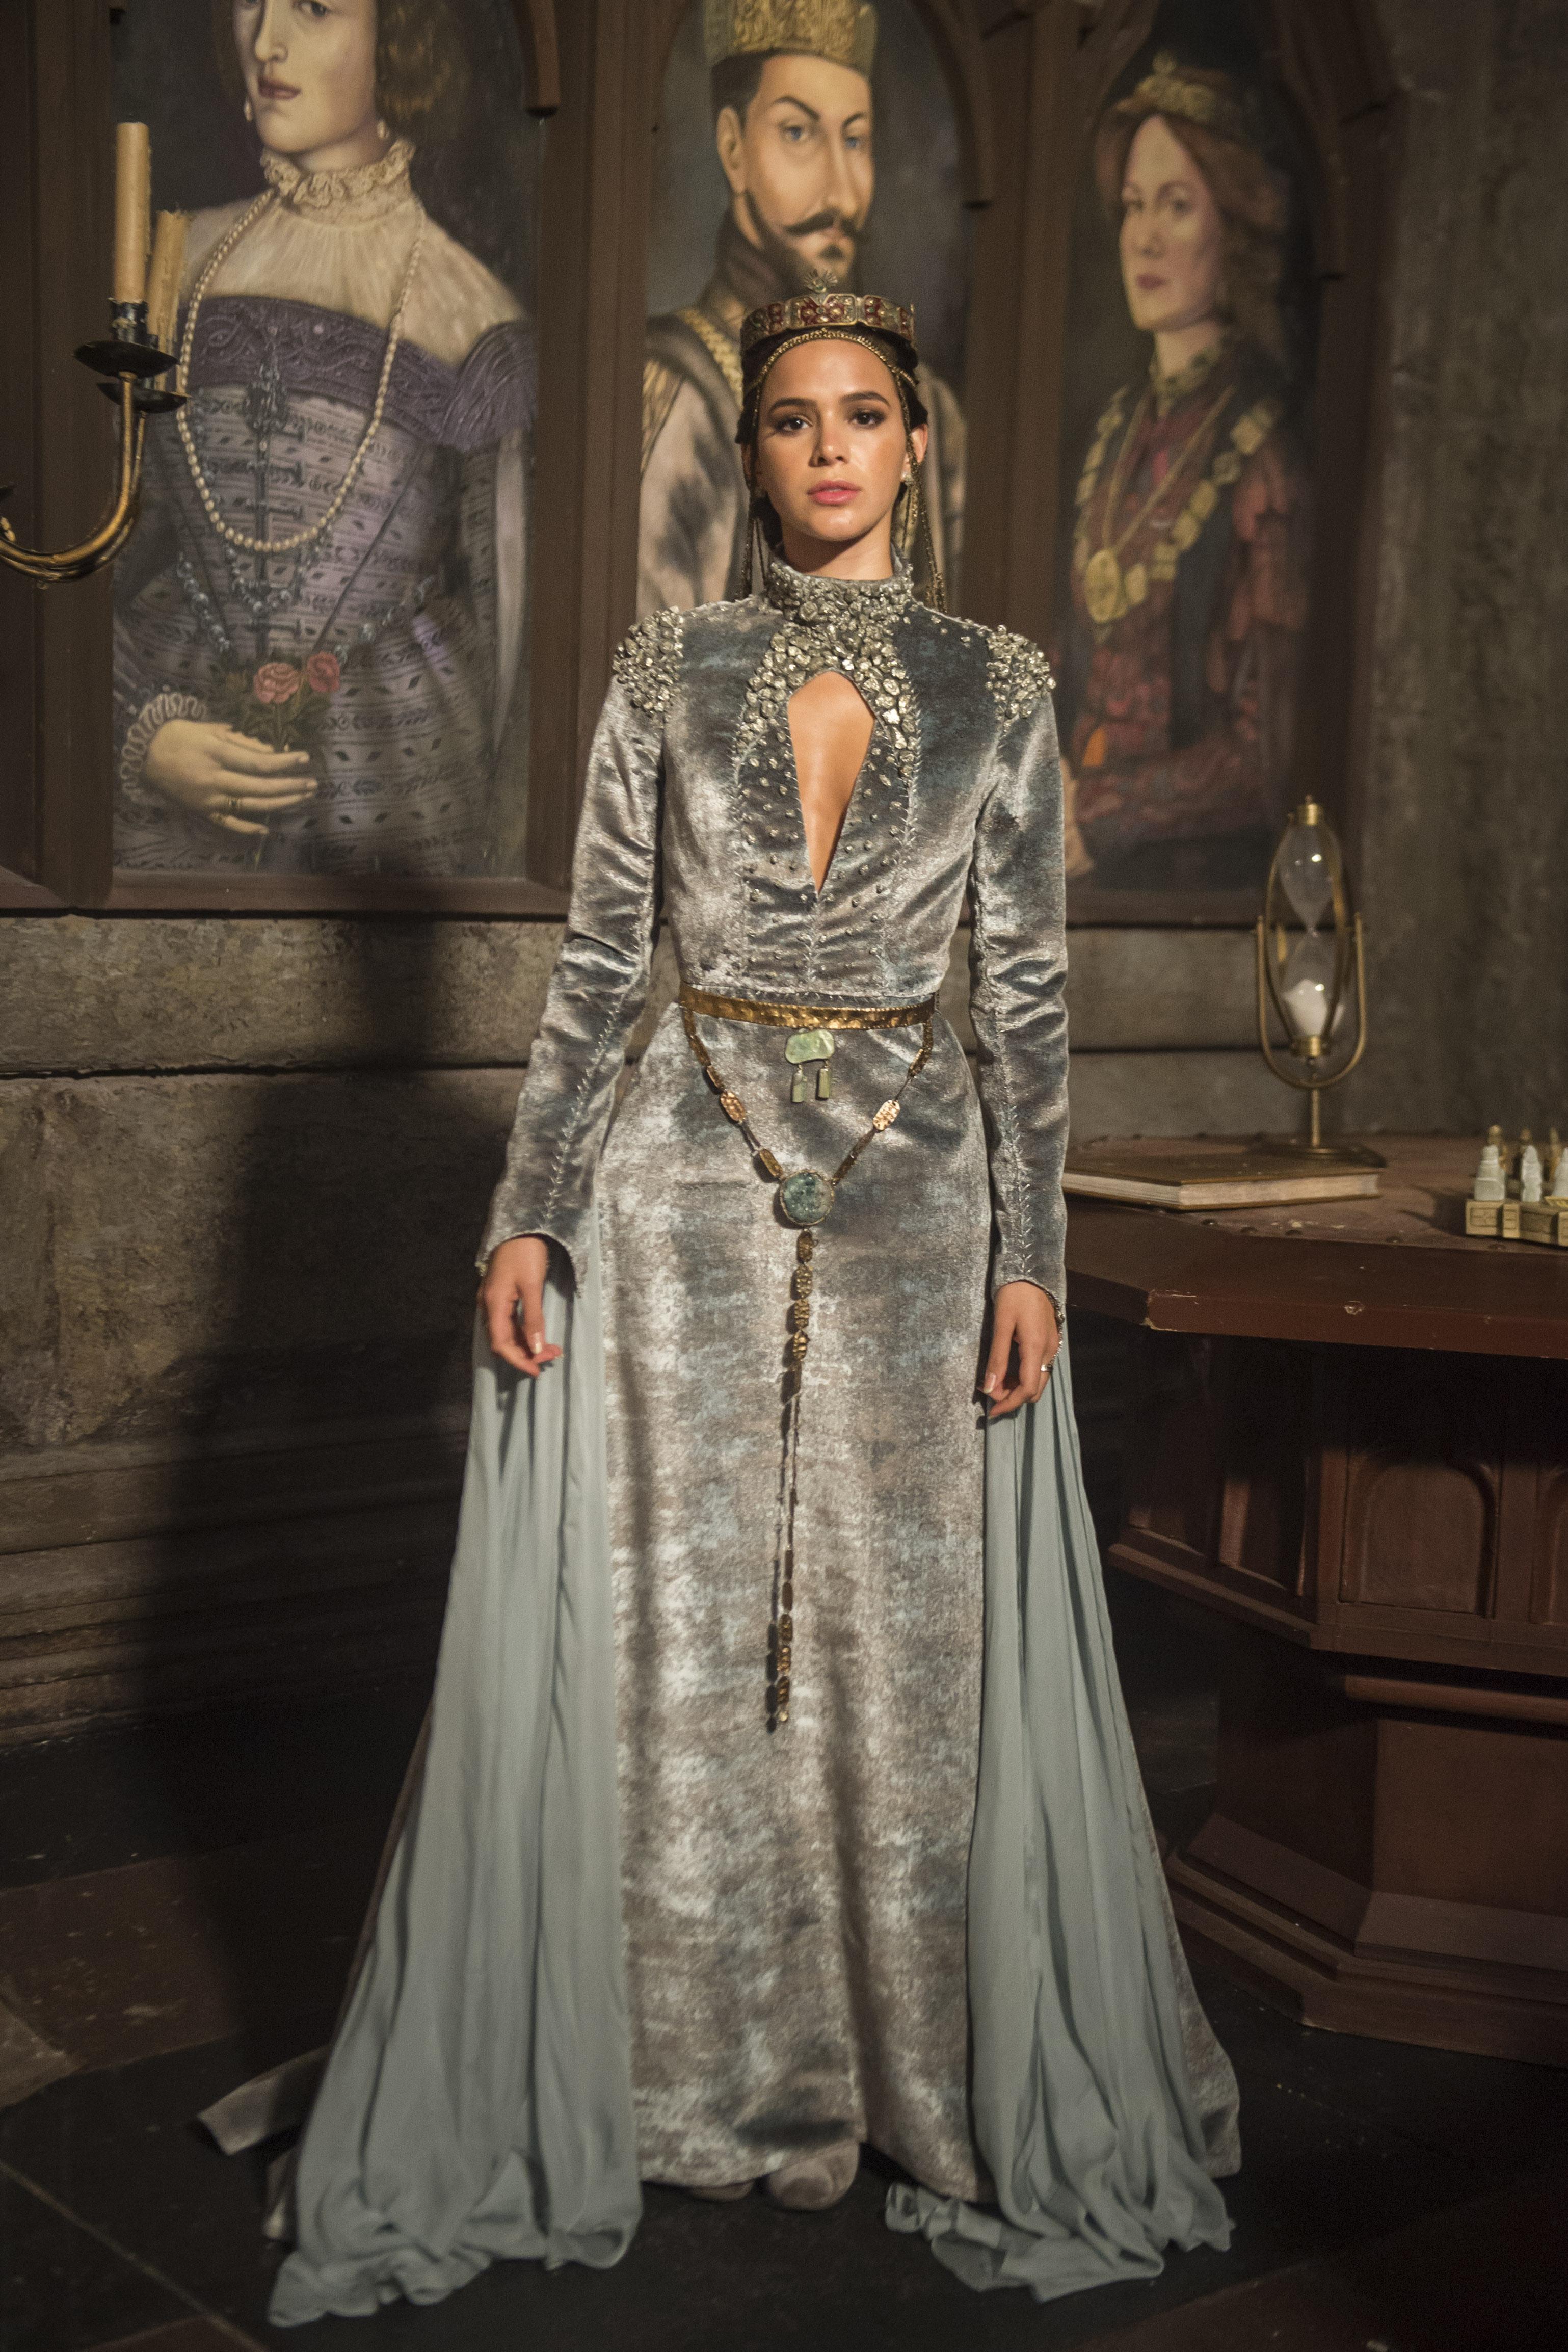 Vestido de noiva de Catarina (Bruna Marquezine)